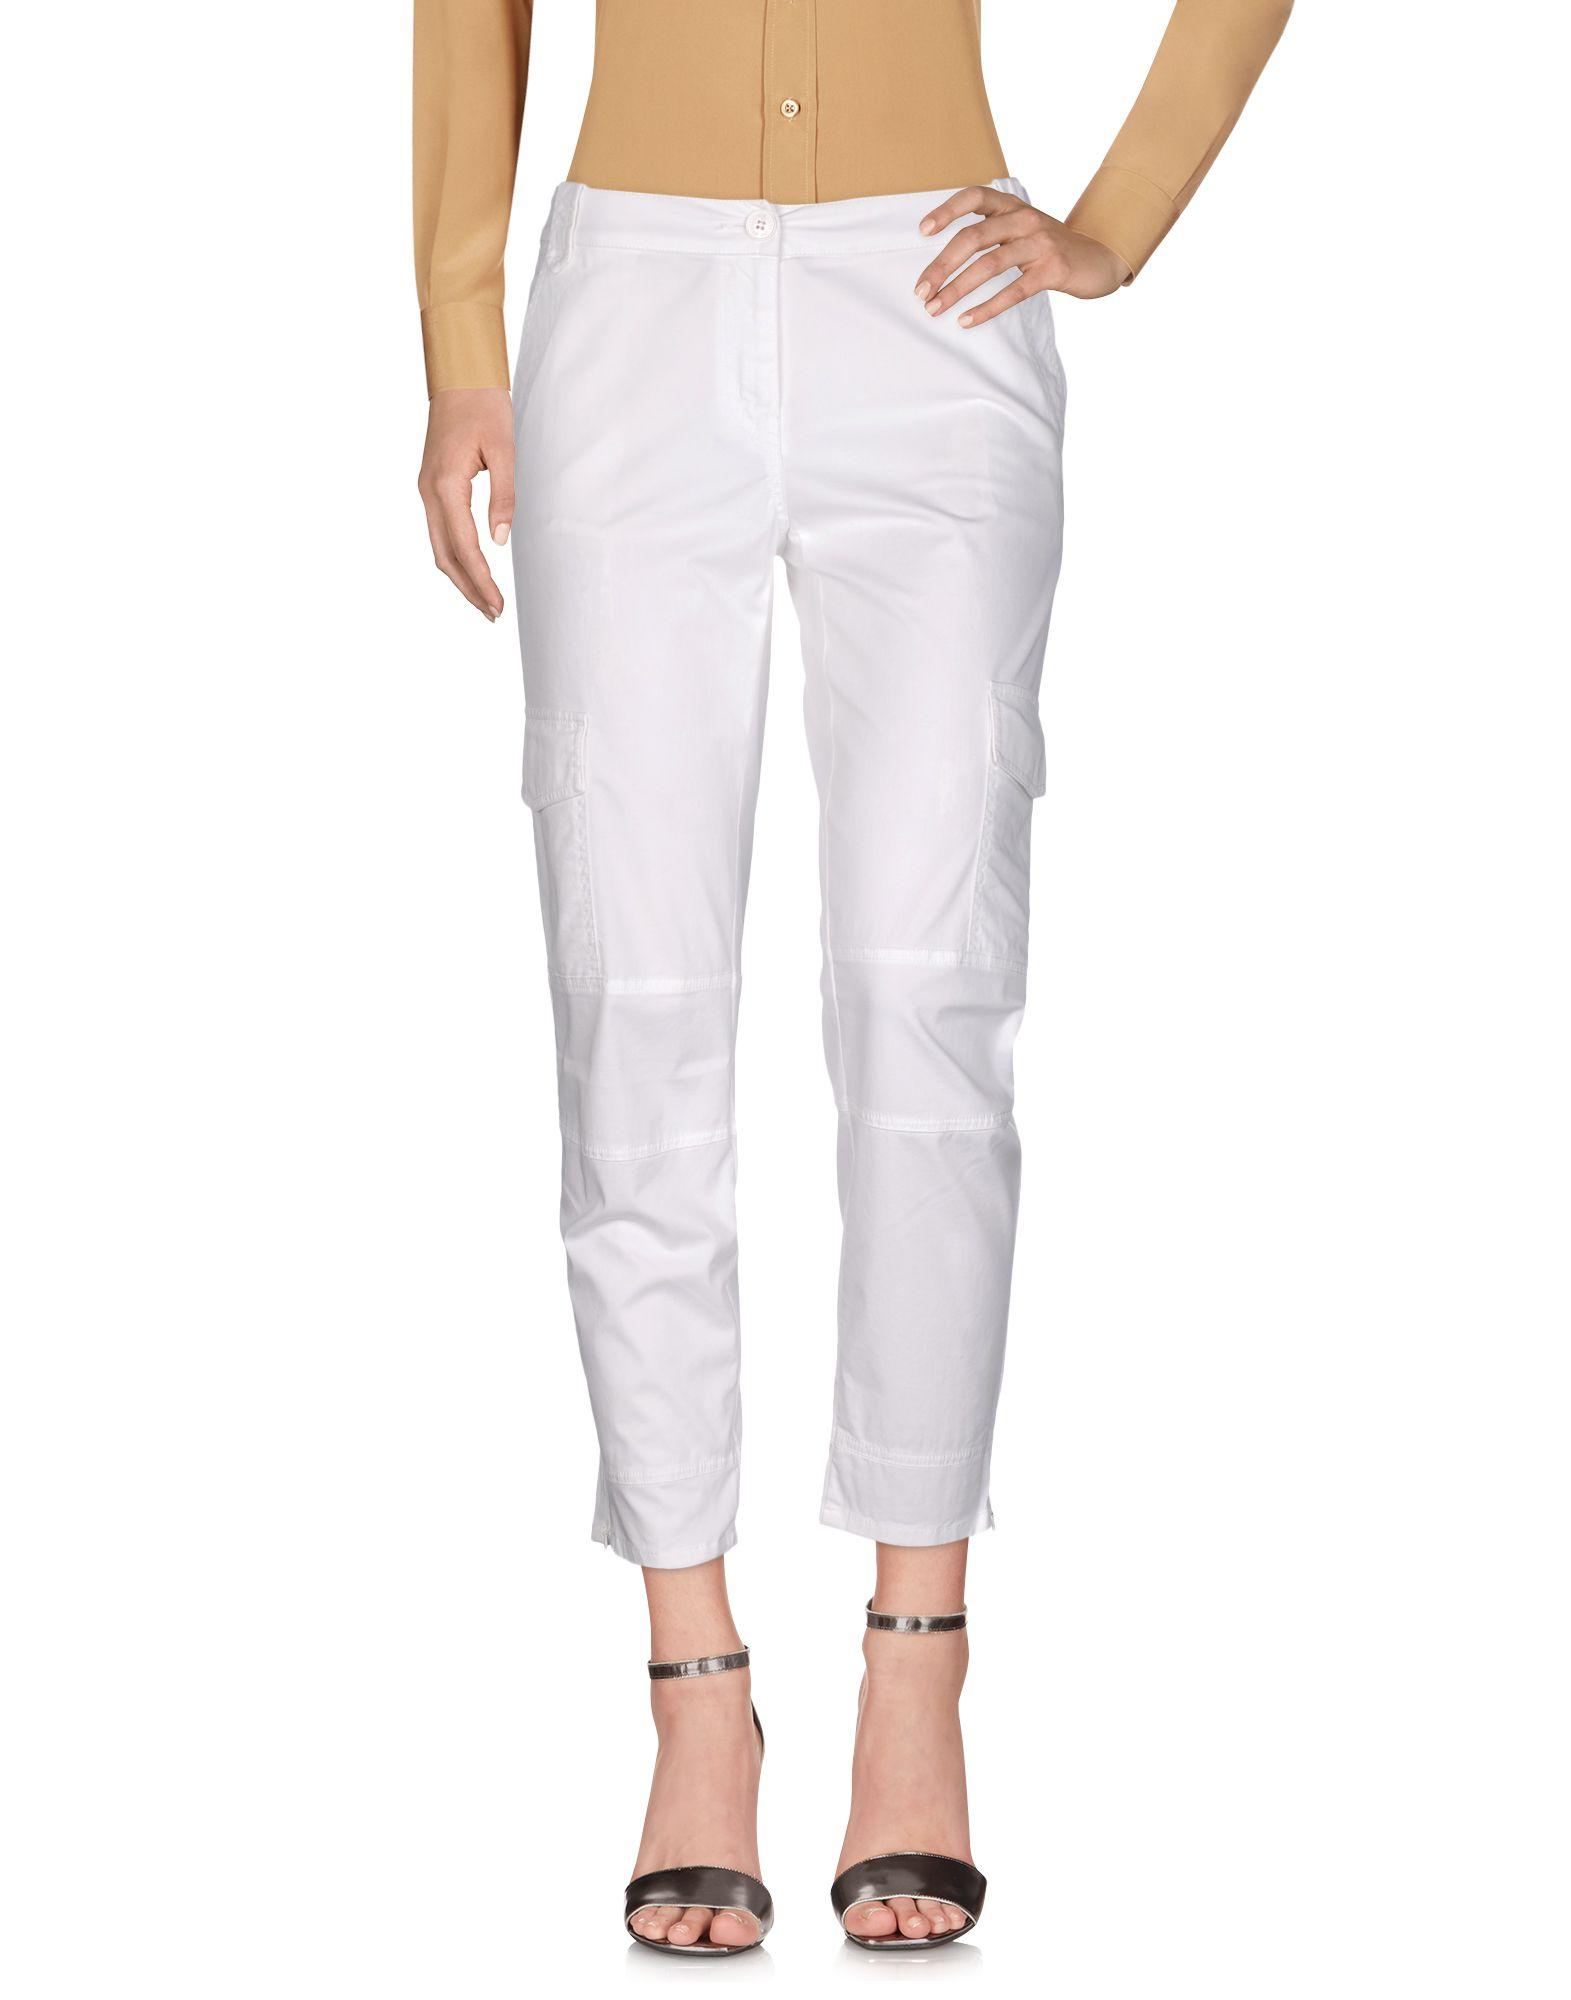 LOVE MOSCHINO Повседневные брюки комплект кофта и леггинсы ido ут 00002821